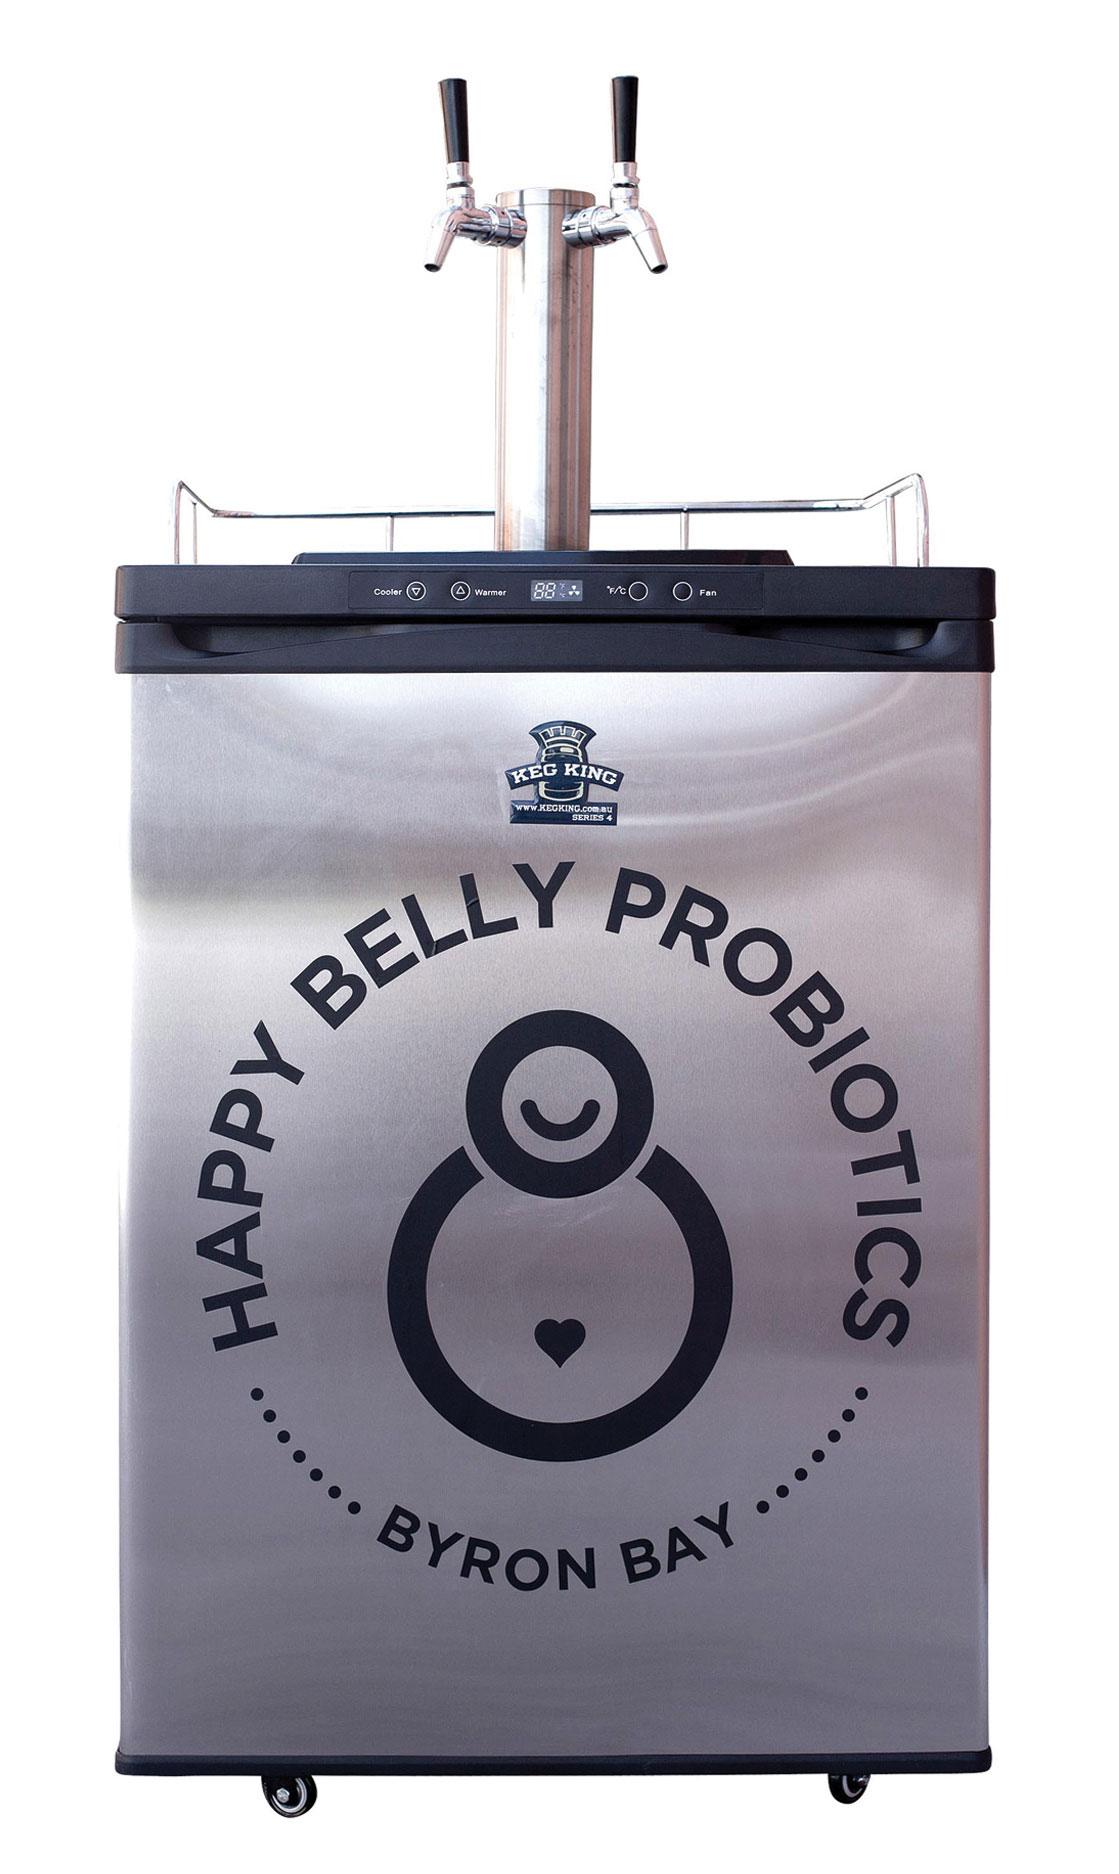 Happy Belly Probiotics, Byron Bay